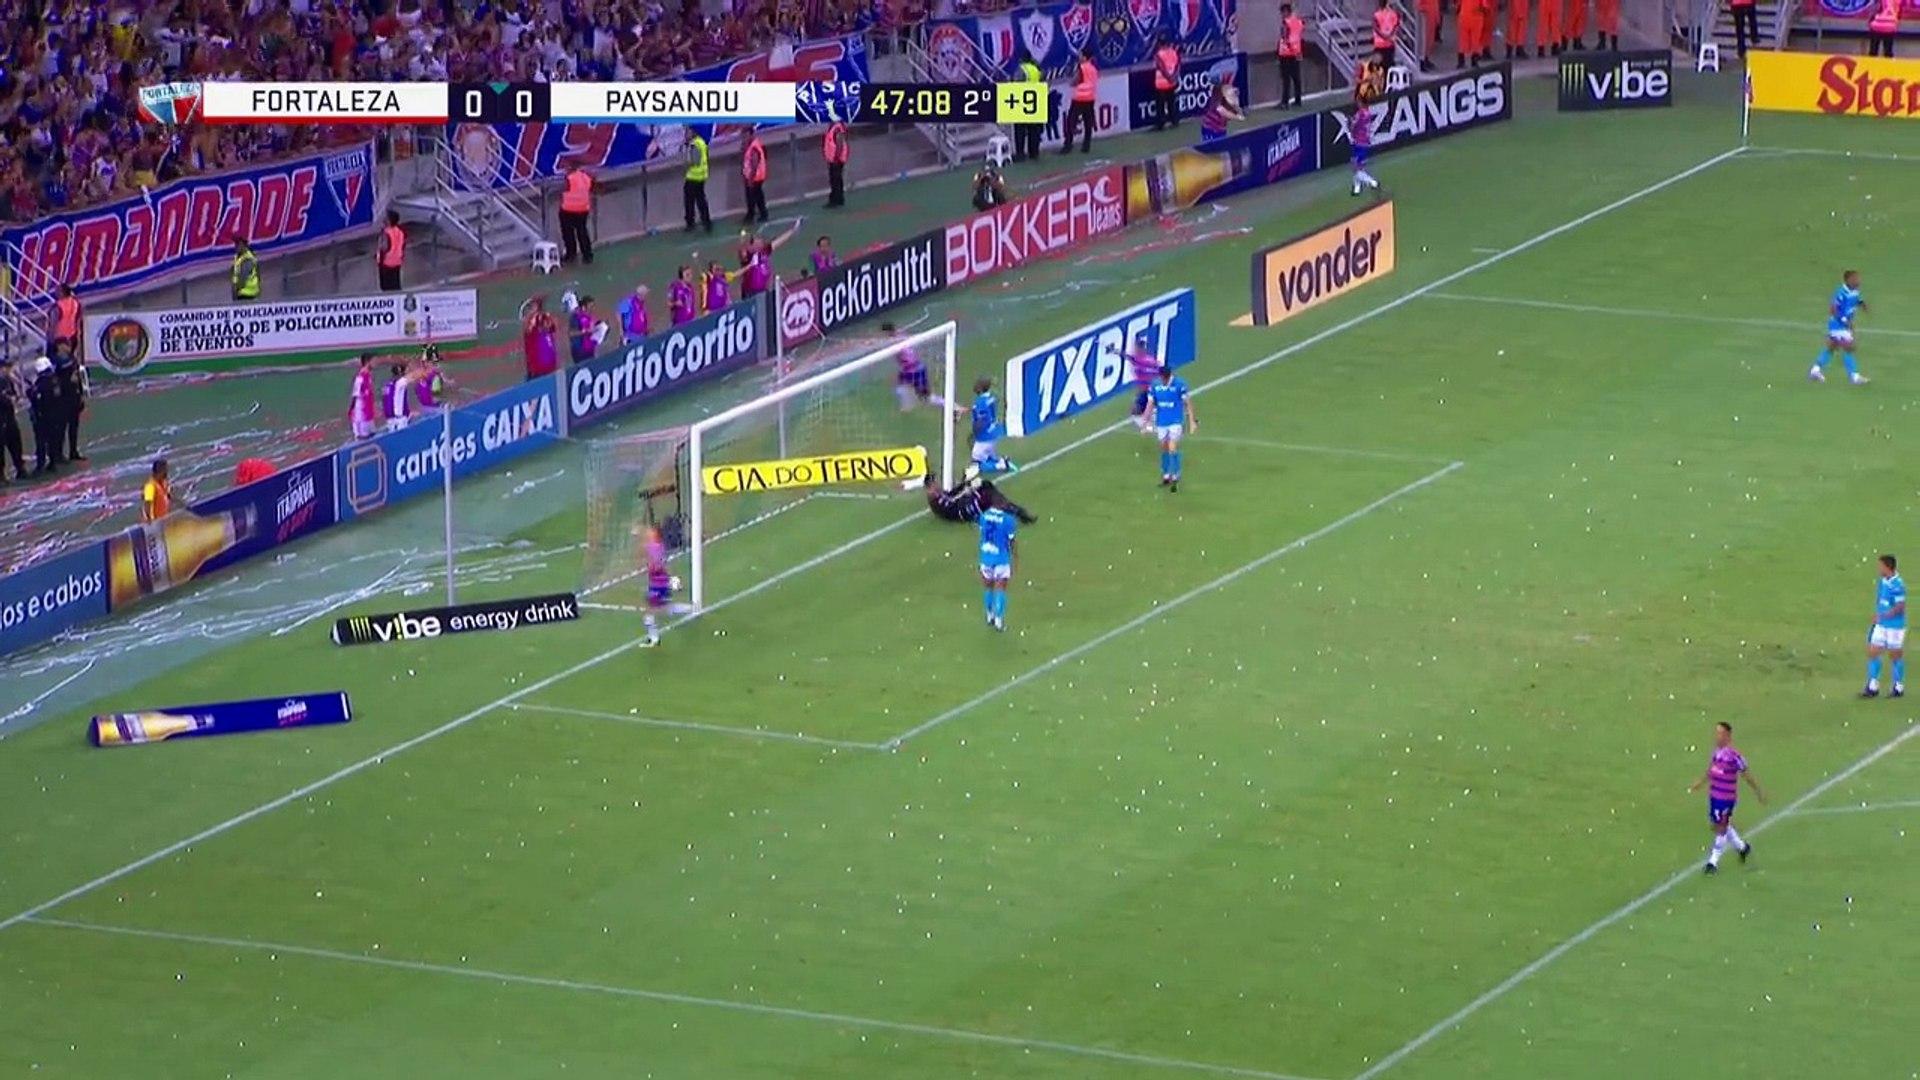 [GOL DE GUSTAVO] Fortaleza 1 x 0 Paysandu - Série B 2018